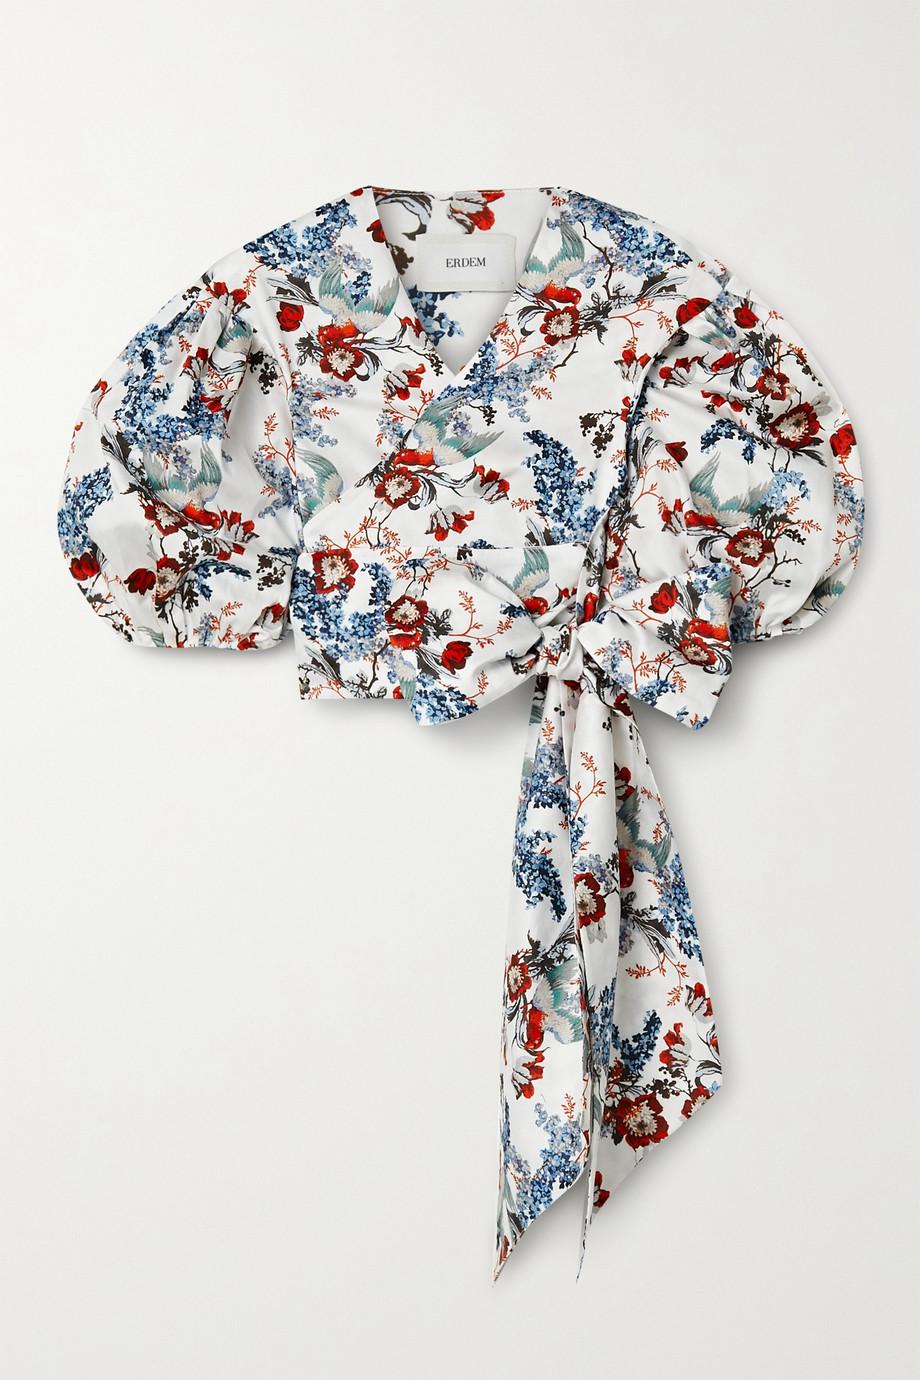 Erdem Cyllene cropped floral-print cotton-poplin wrap top